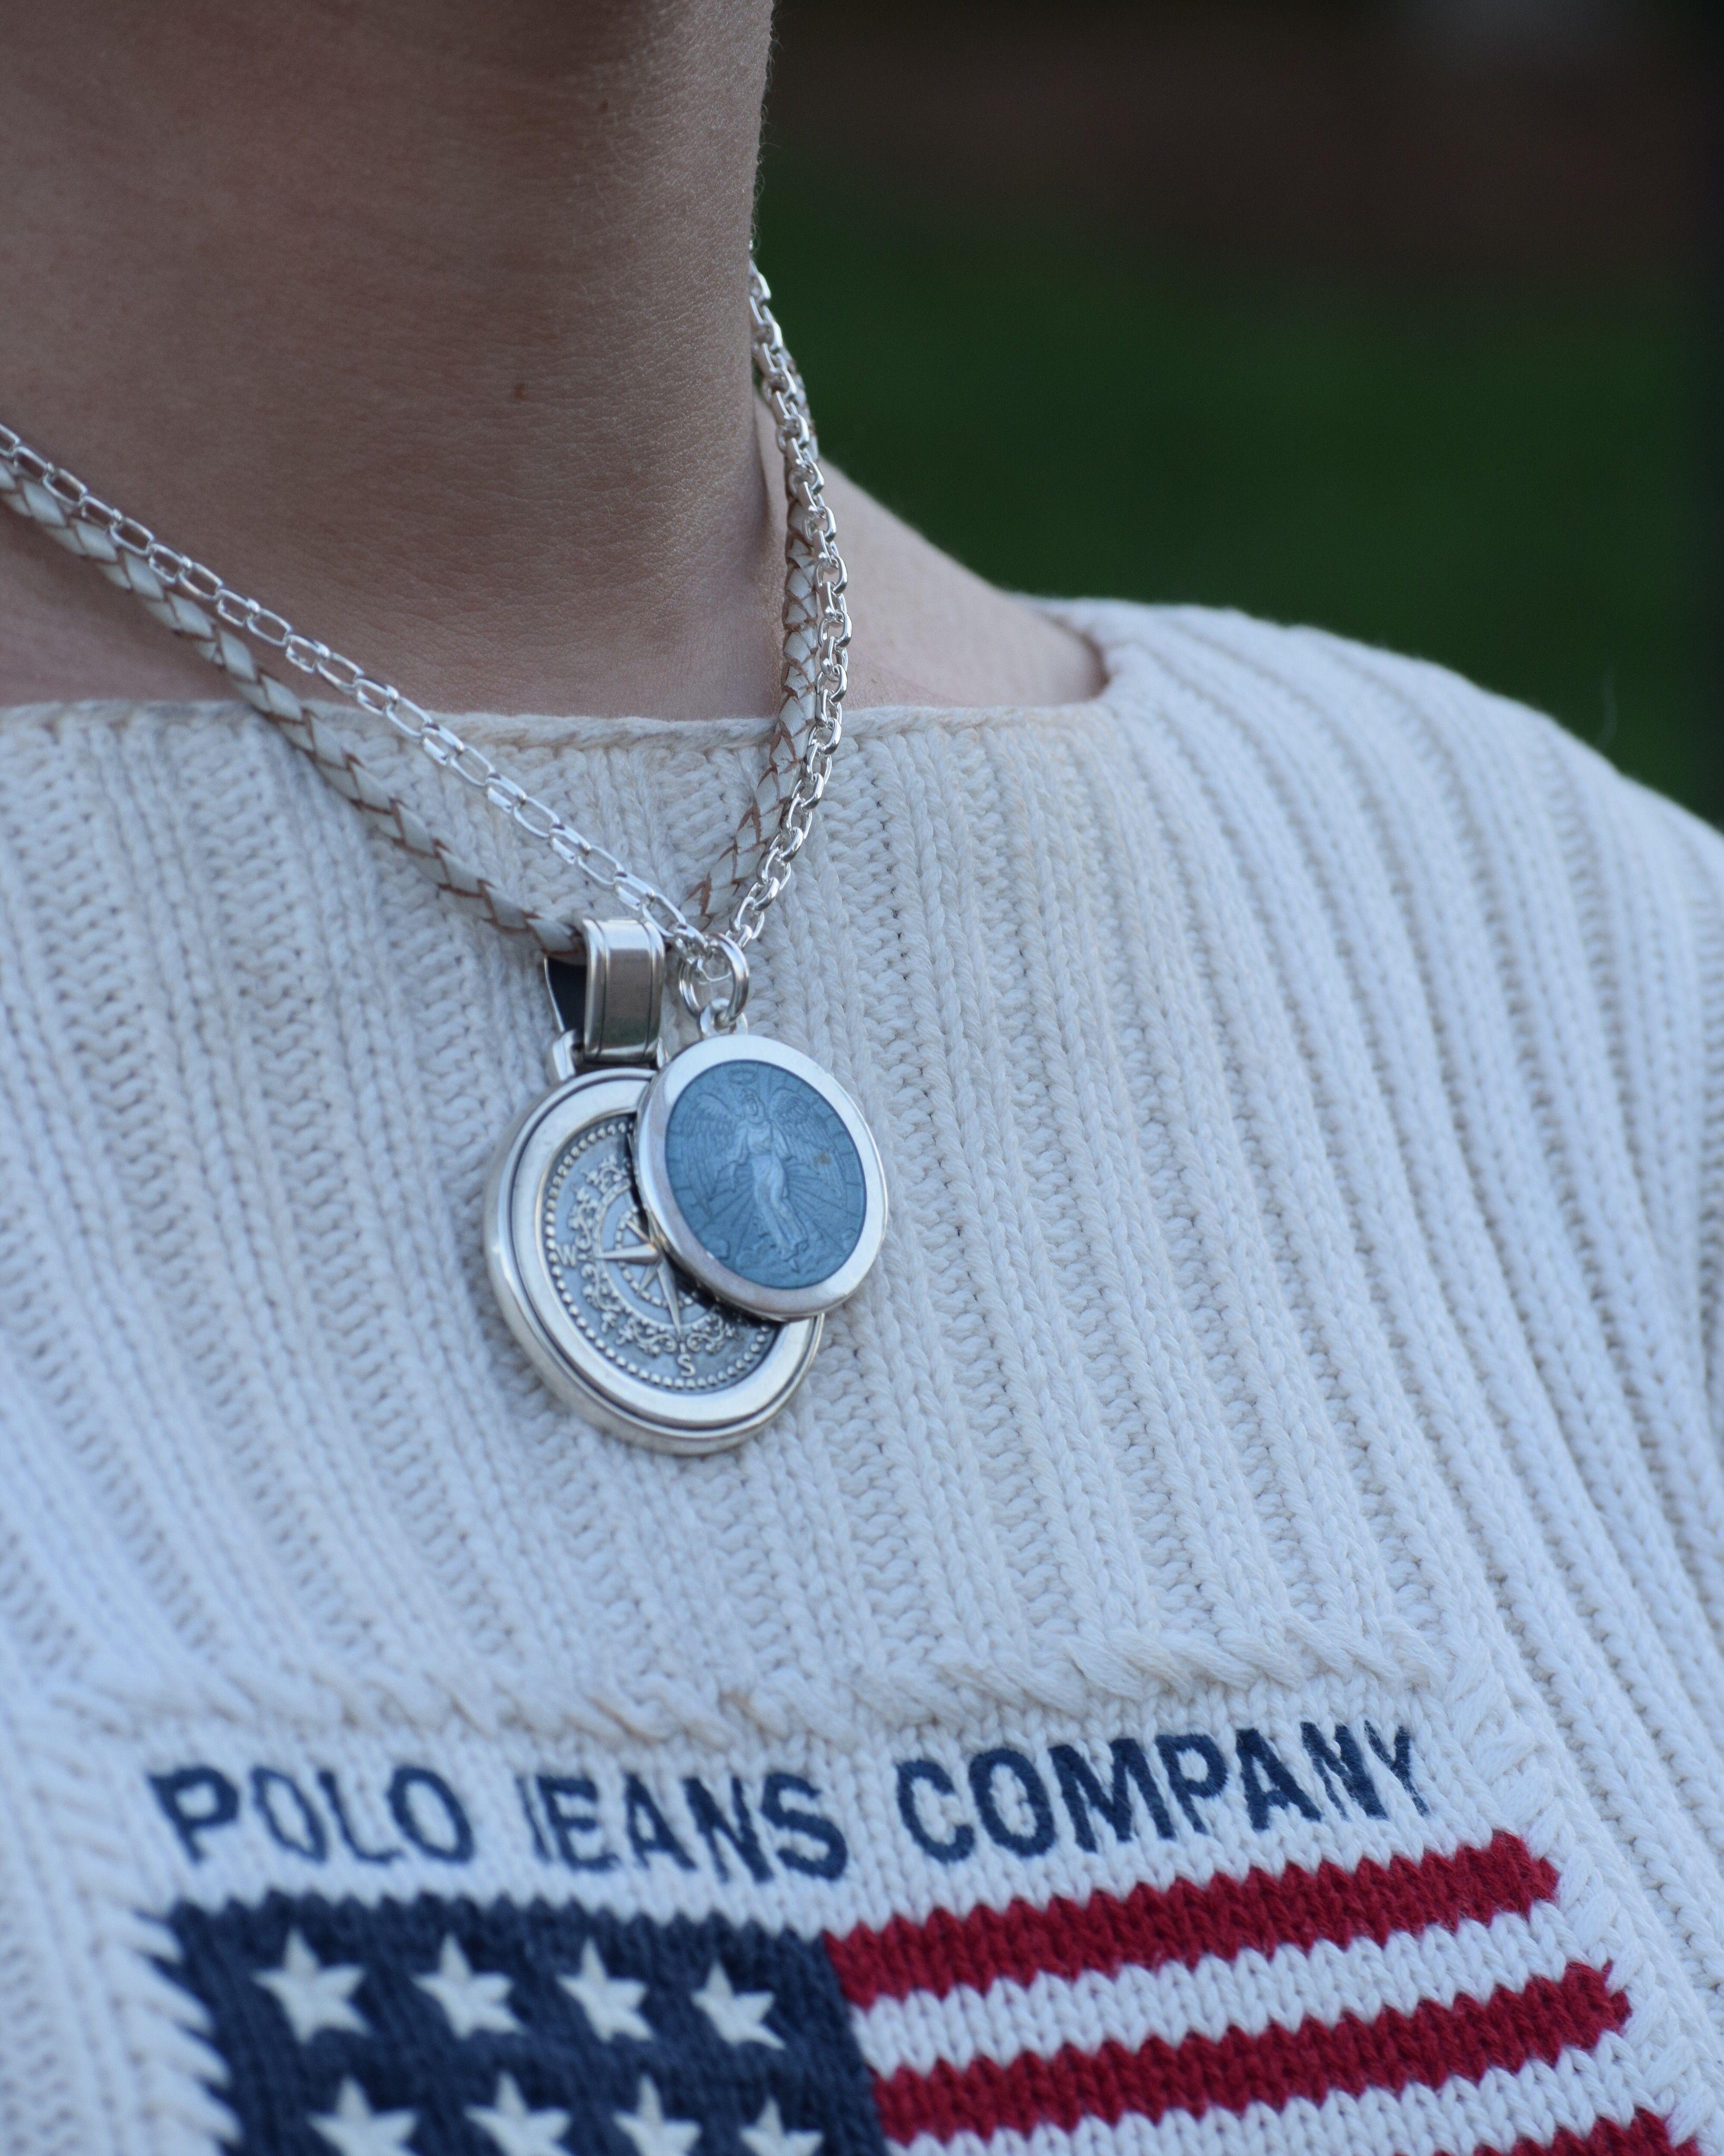 fc6510b5291 100% made in USA #colbydavis #madeinusa | Our Colby Davis Jewelry ...